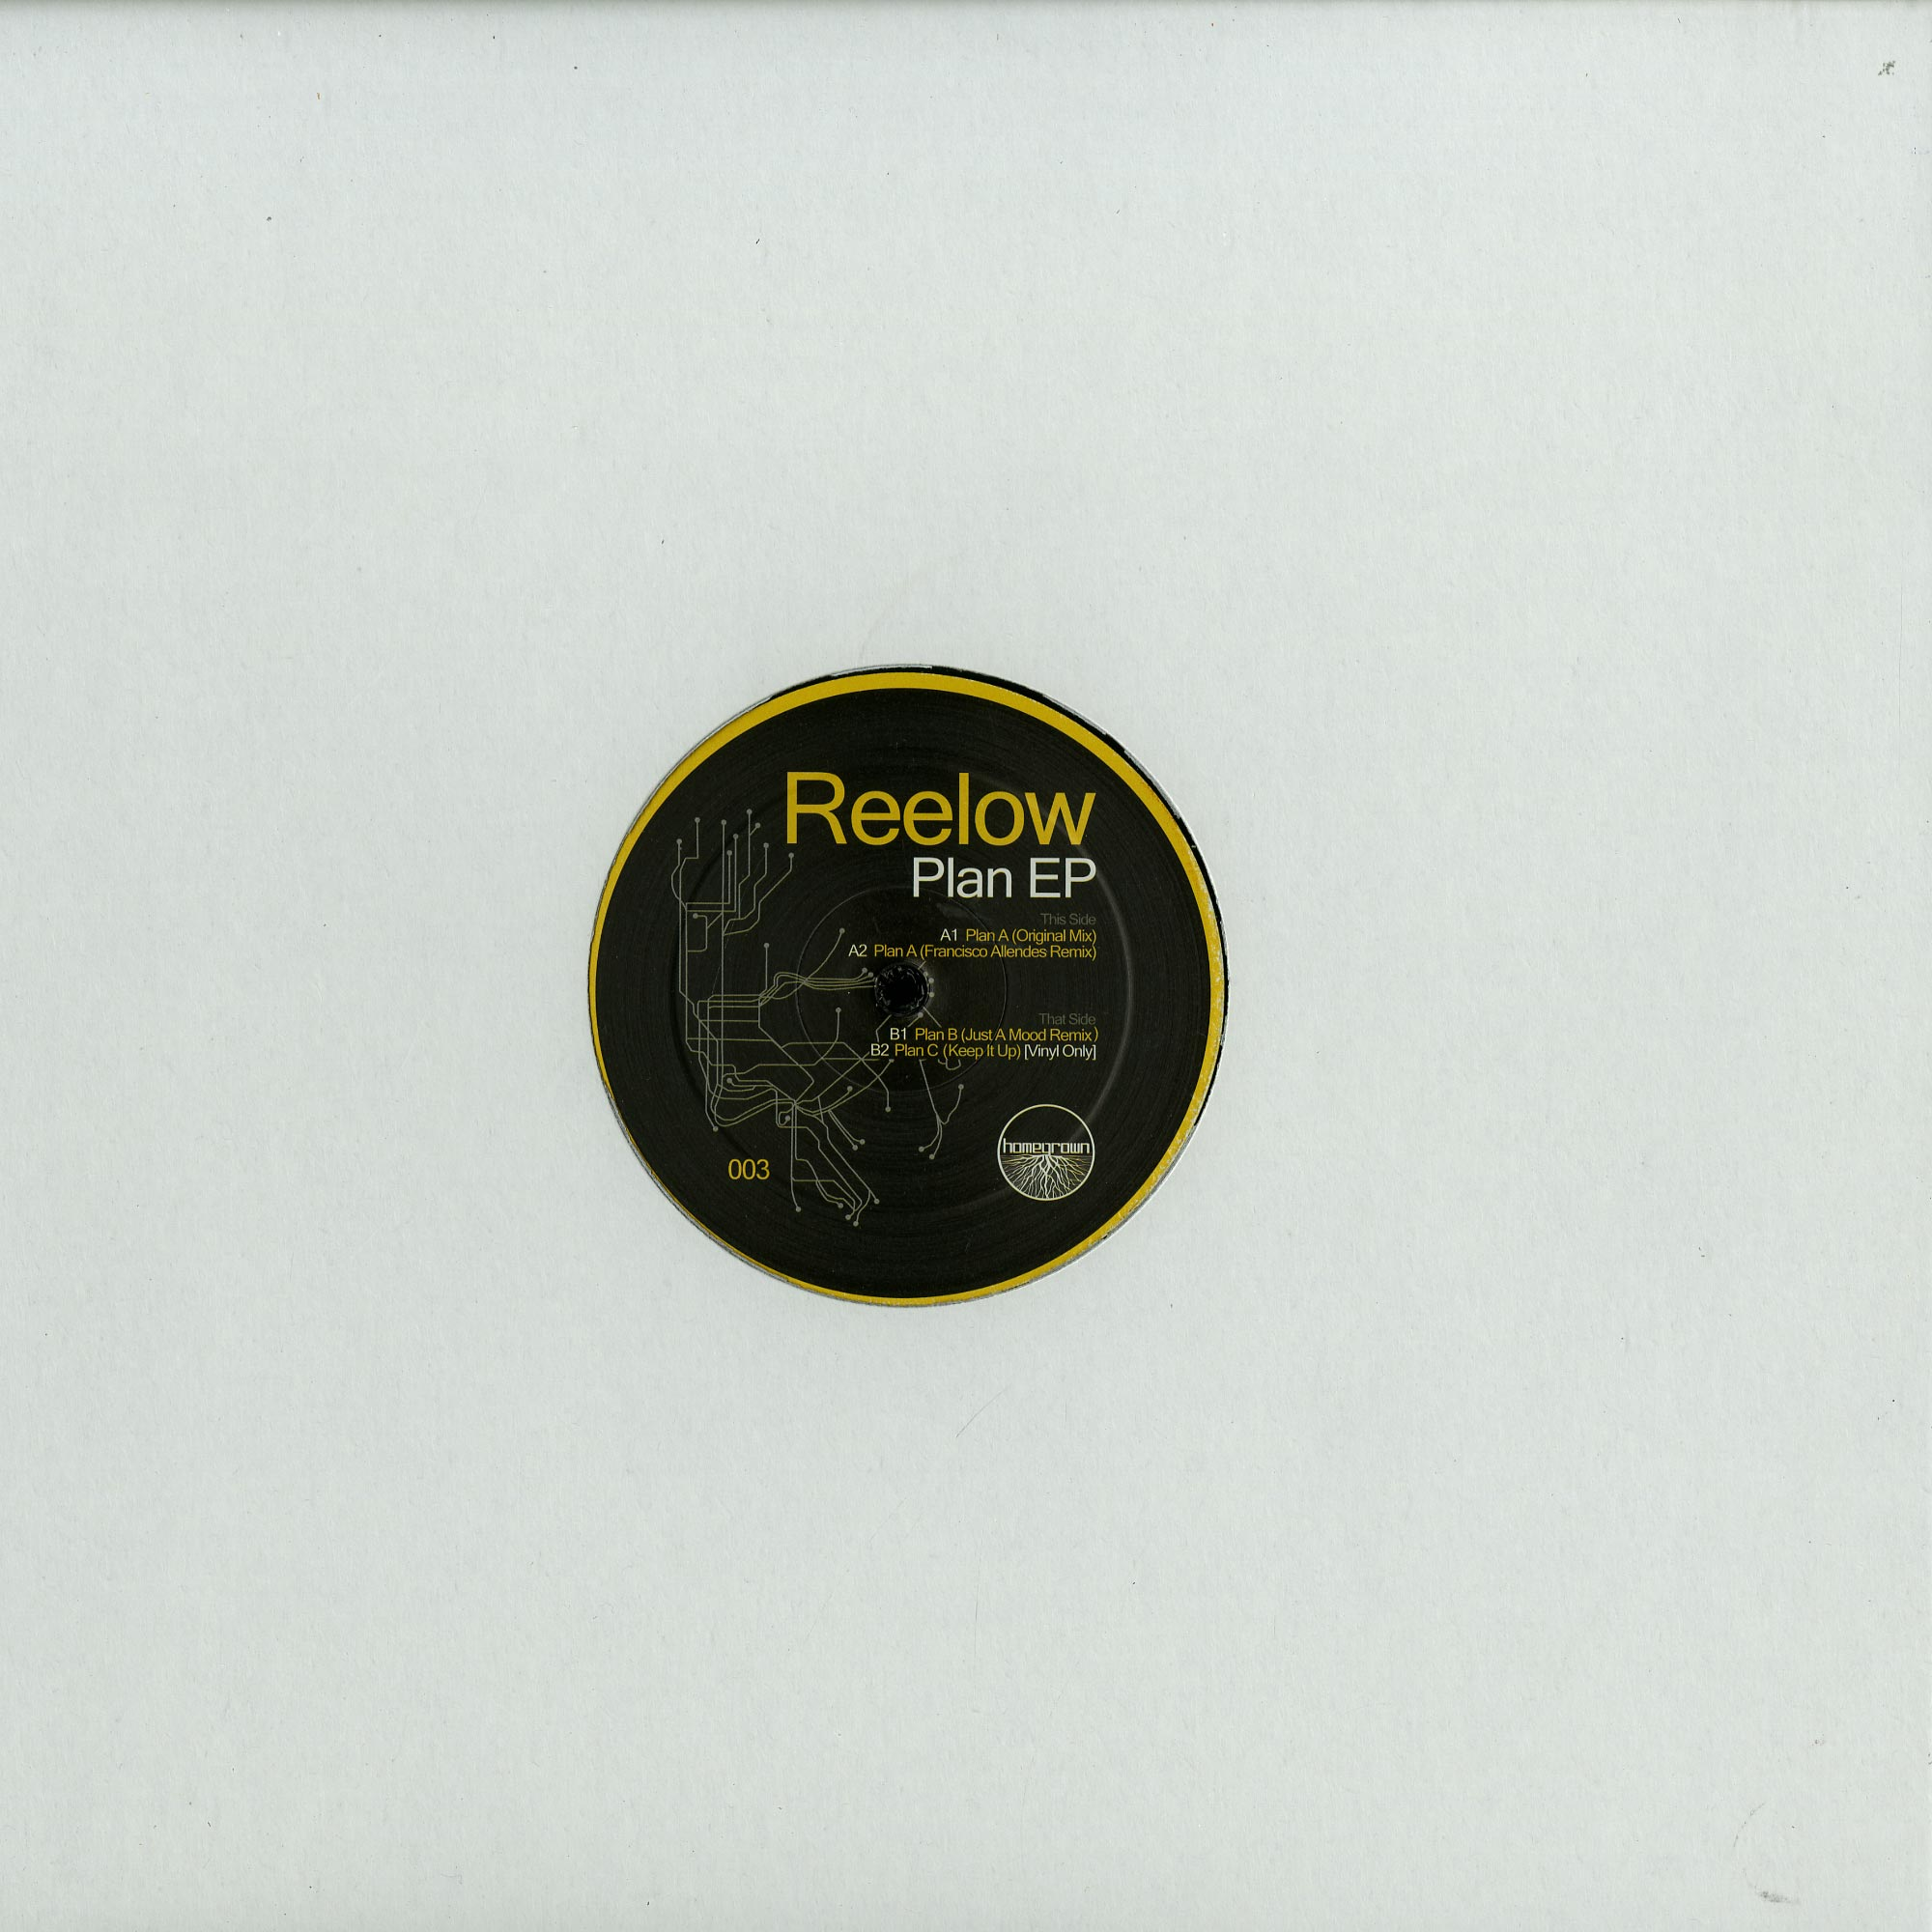 Reelow - PLAN EP